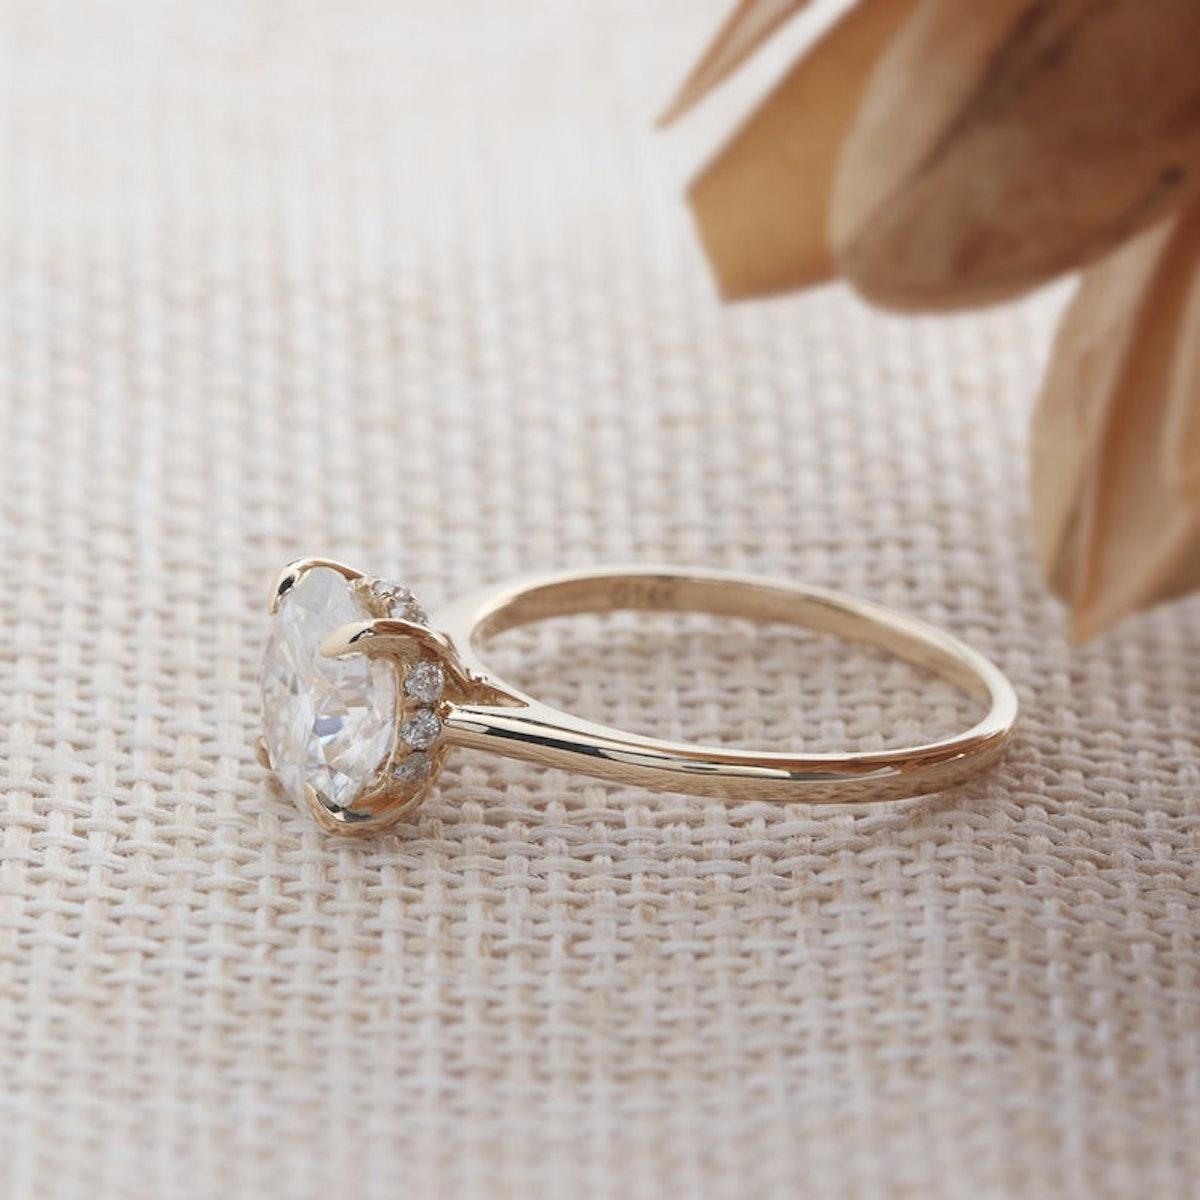 Hidden Halo Engagement Ring/ 8.0mm Round Cut Moissanite Ring/ 4 Prongs Promise Ring/ 14K Gold Ring/ ...